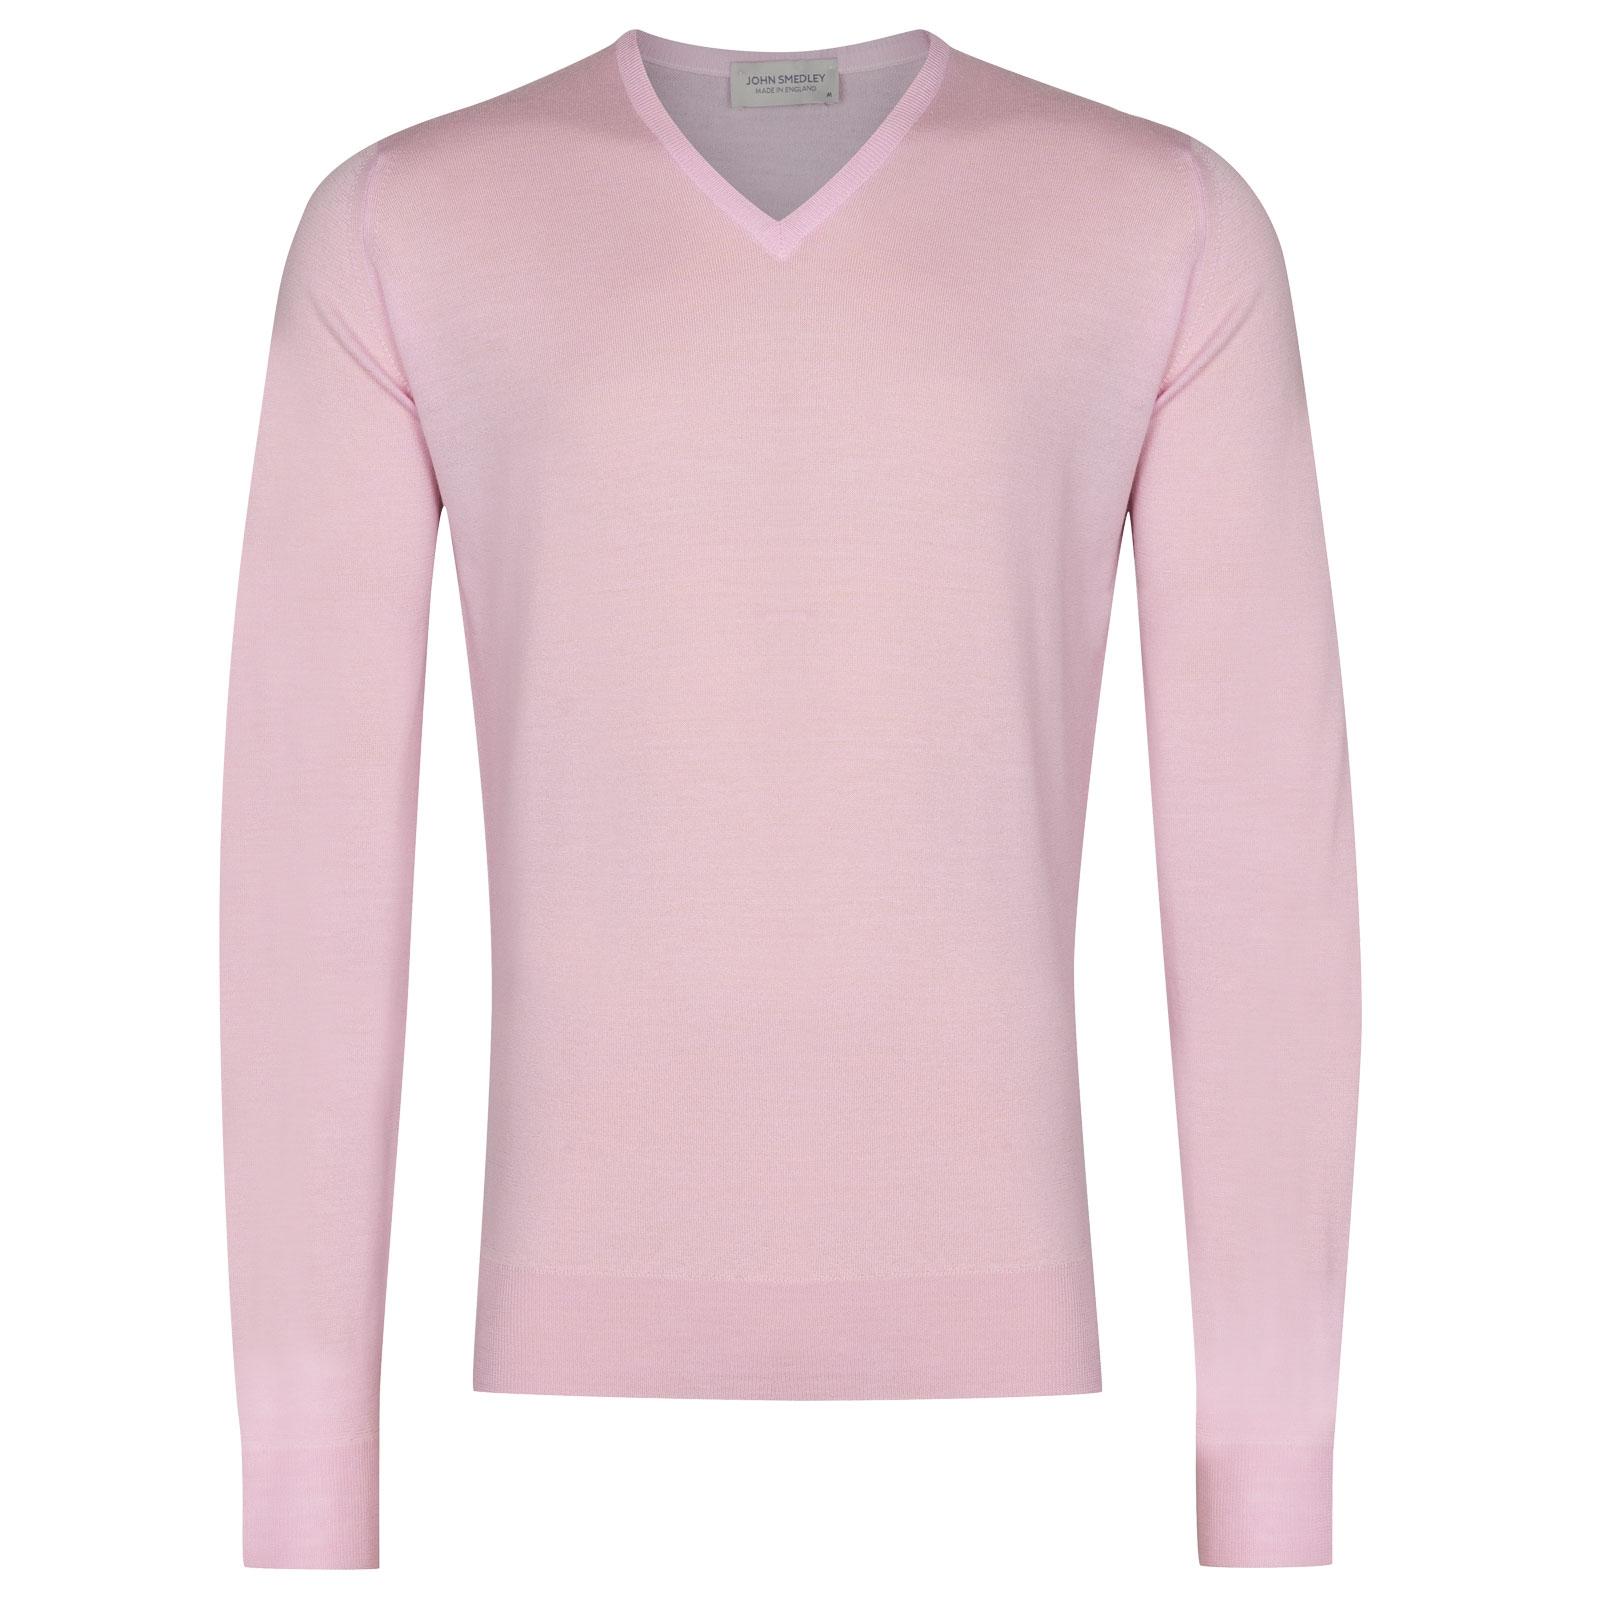 John Smedley Blenheim in Pink Blossom Pullover-XLG